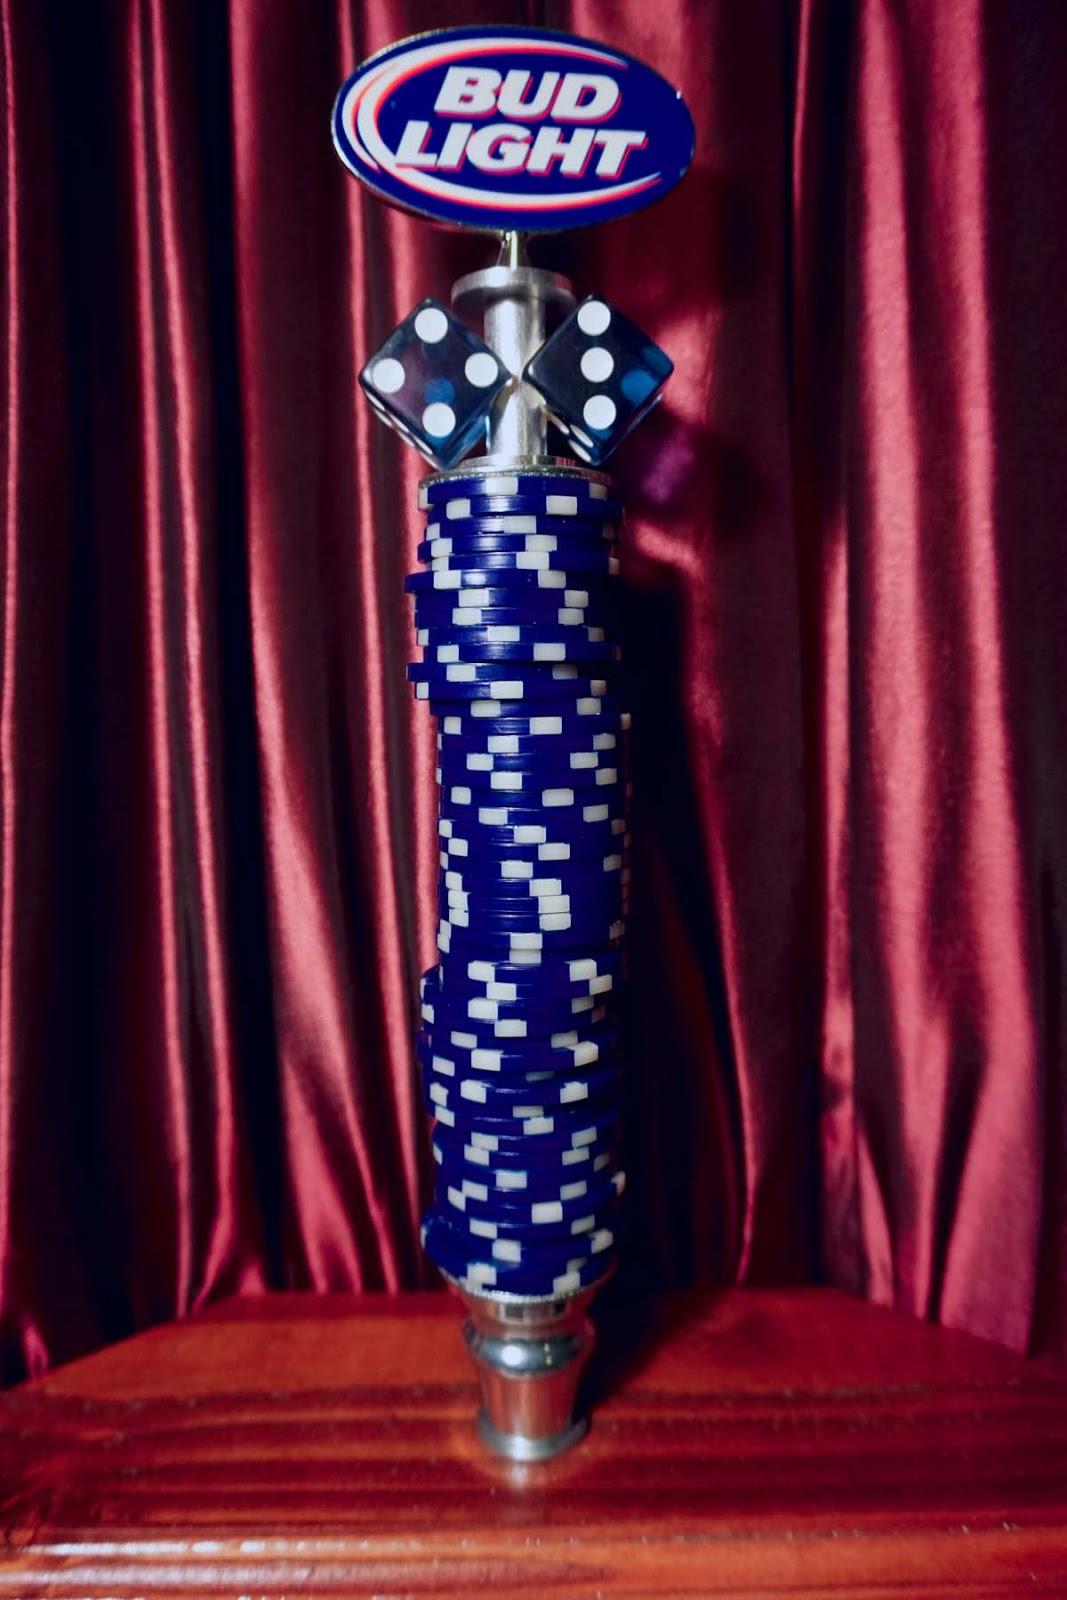 Poker chips beer tap handle roulette gratis on line senza registrazione